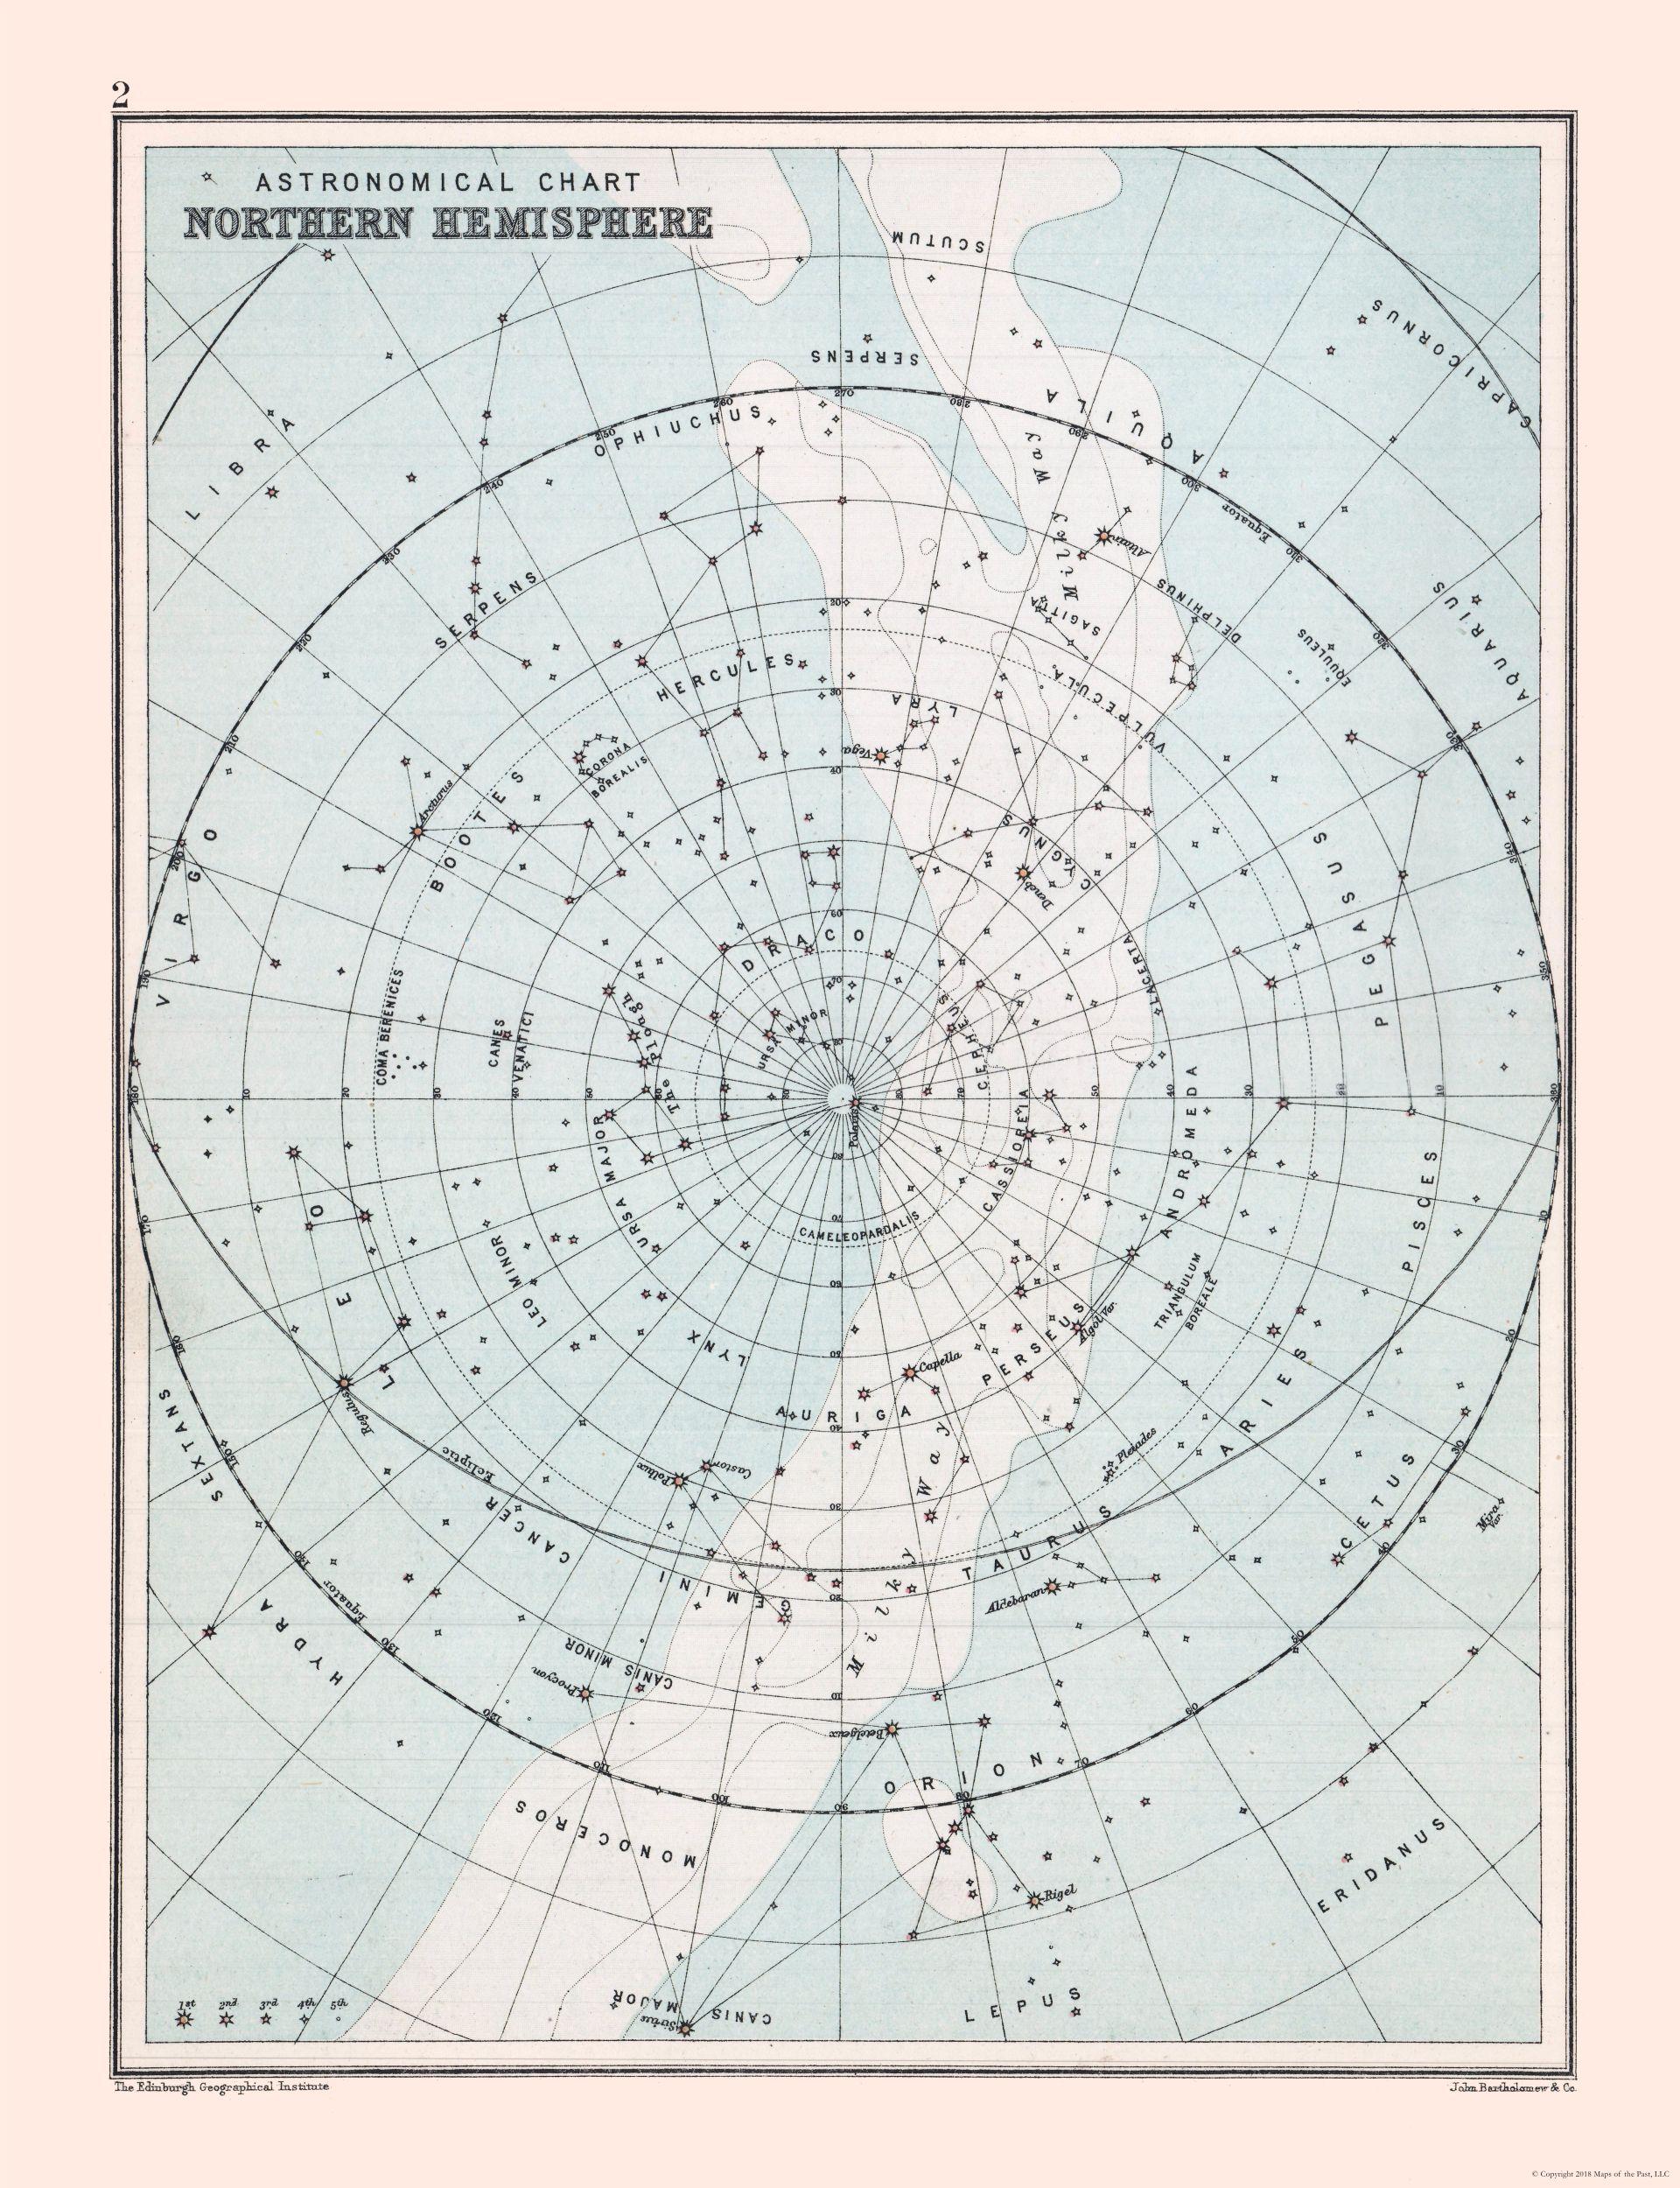 Old International Maps Star Chart Of Northern Hemisphere